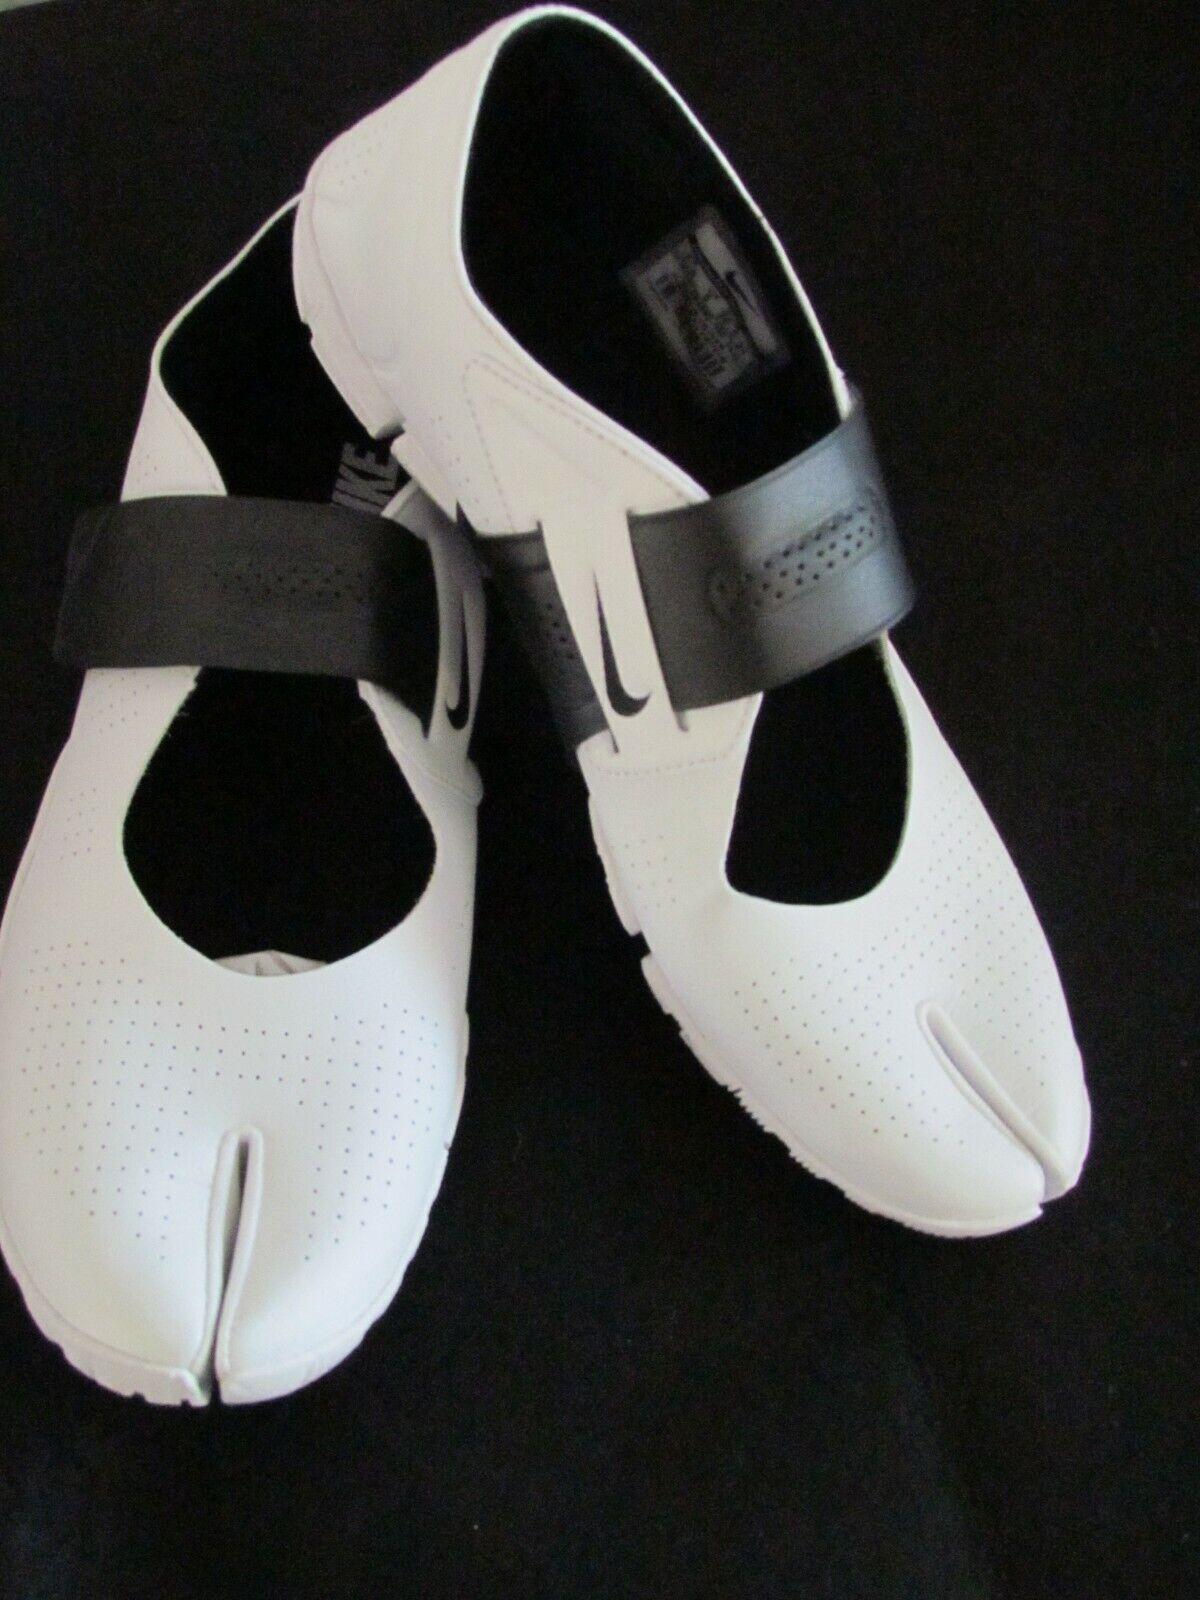 Nike Free Gym shoes Split Toe Toe Toe 524892-100 Women Size US 7  UK 4.5 EU 38 New w box 3ab436